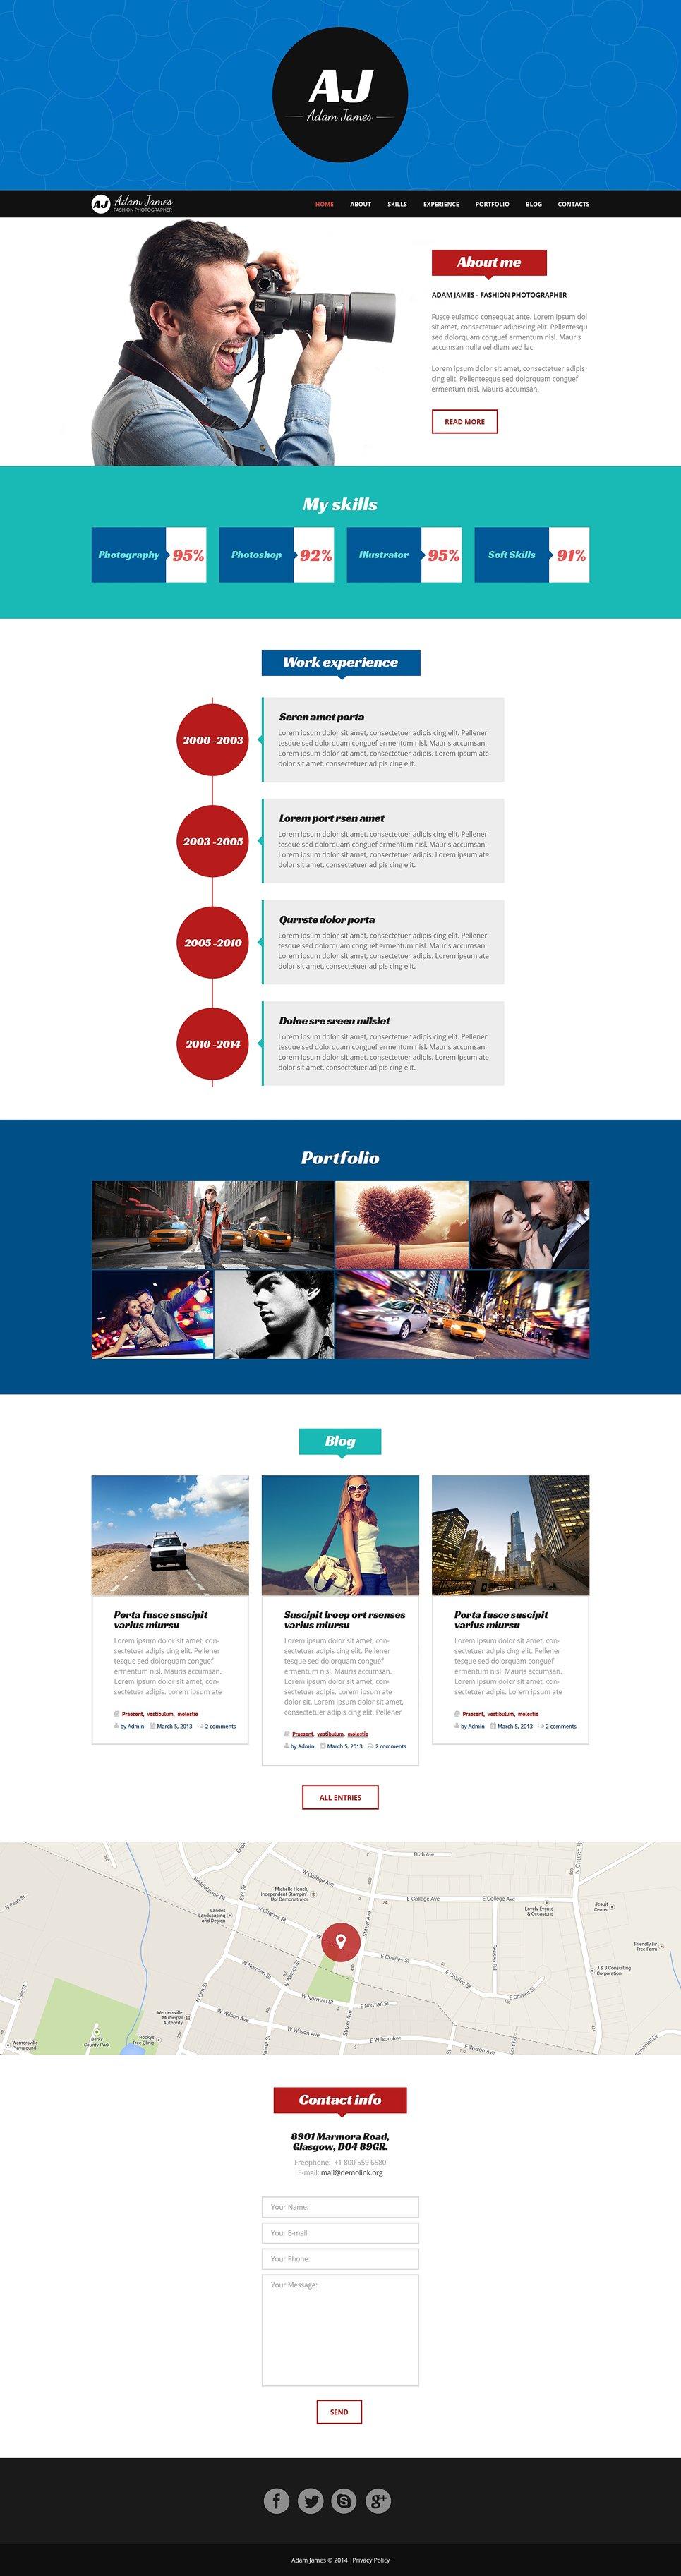 Адаптивный шаблон сайта на тему портфолио фотографа #49155